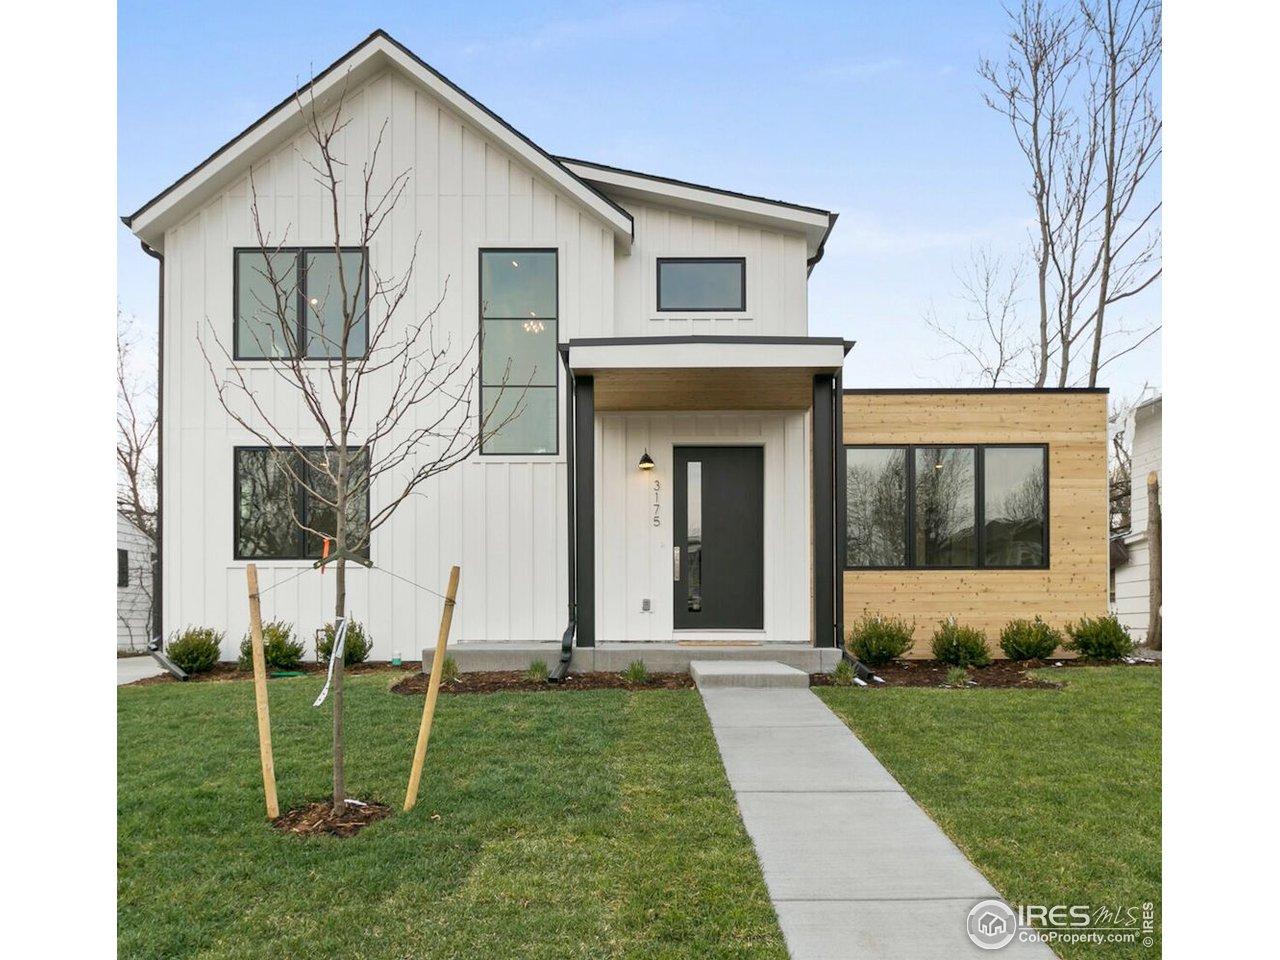 3175 17th St, Boulder CO 80304